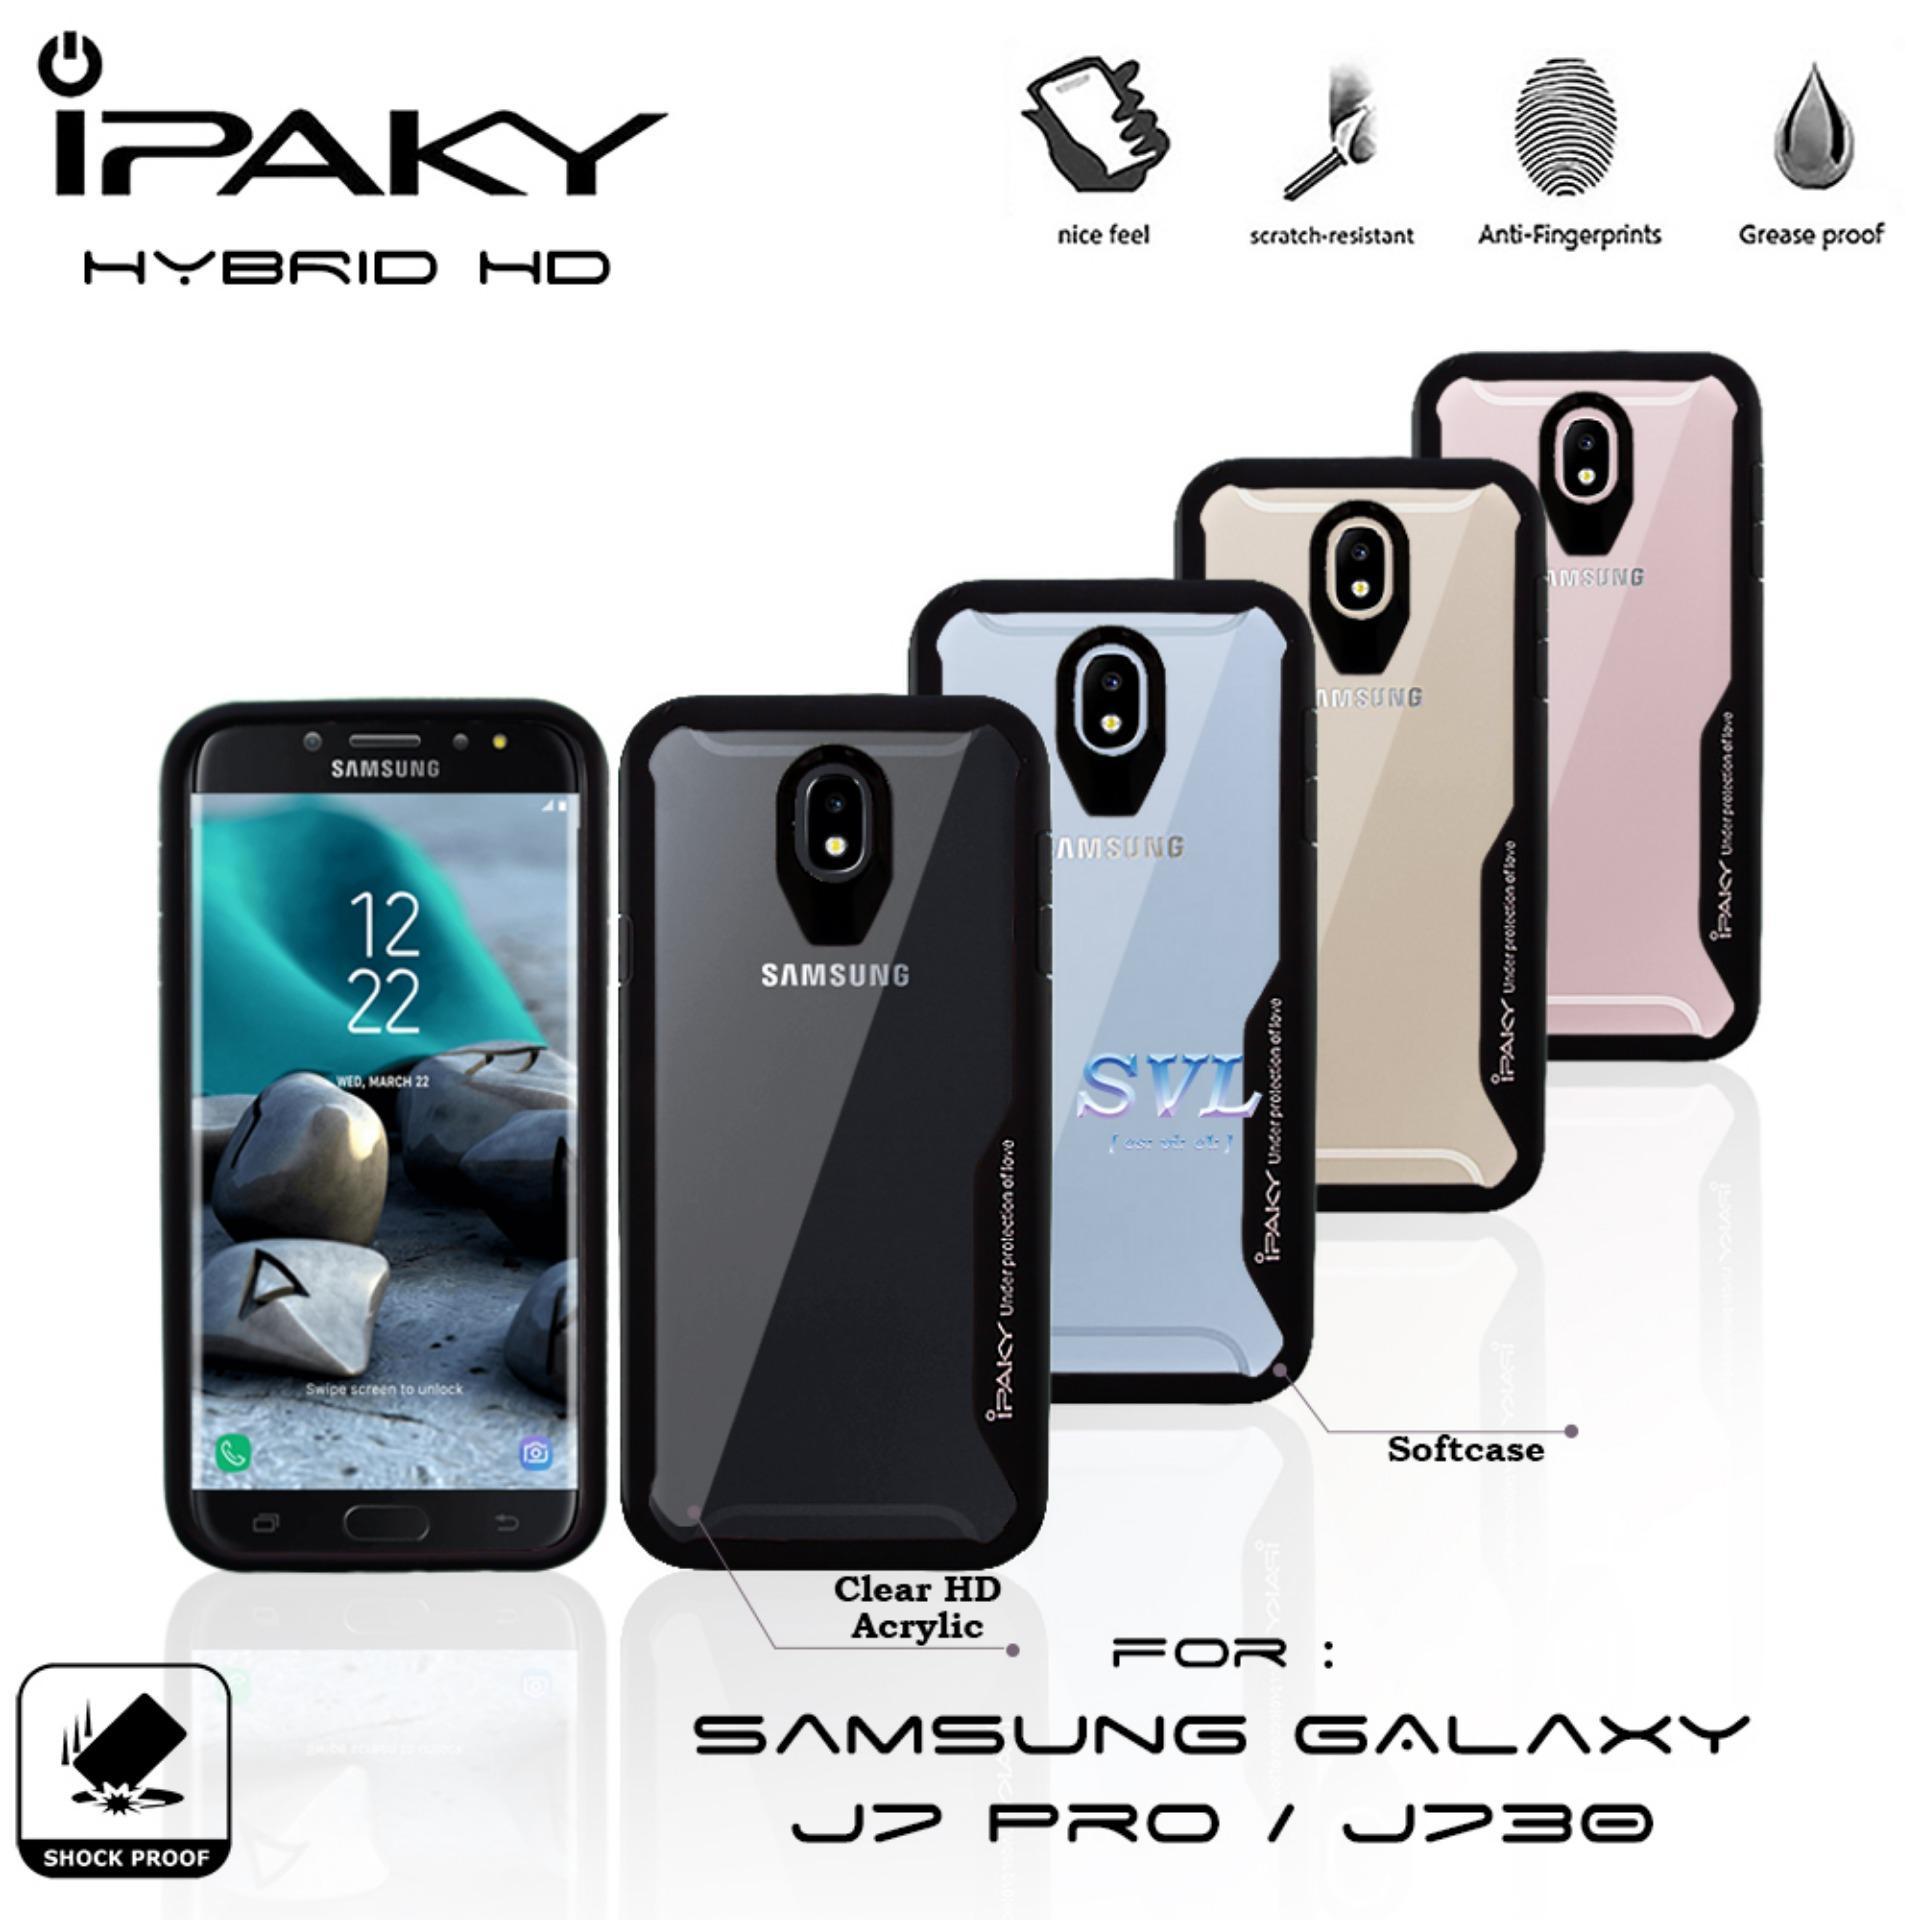 Casing Ponsel Ipaky Terlengkap Case Xiaomi Redmi Note 5a Non Finger Print Carbon Cover Karbon Premium Softcace Silikon Samsung Galaxy J7 Pro J730 Hd Acrylic Softcase